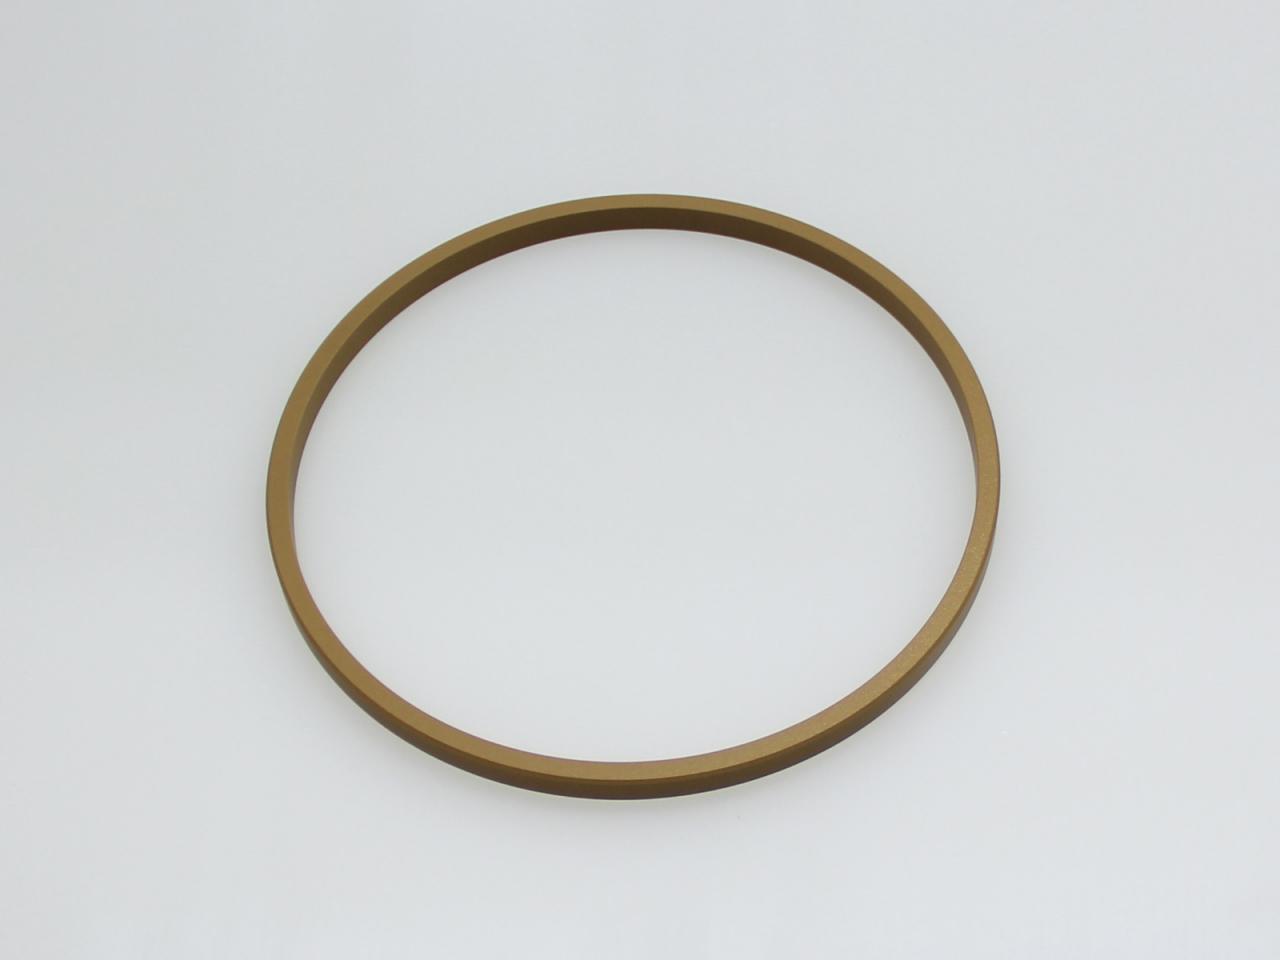 DSH-Piston Seal Design | Piston Seal Bronze Filled PTFE Glyd Ring